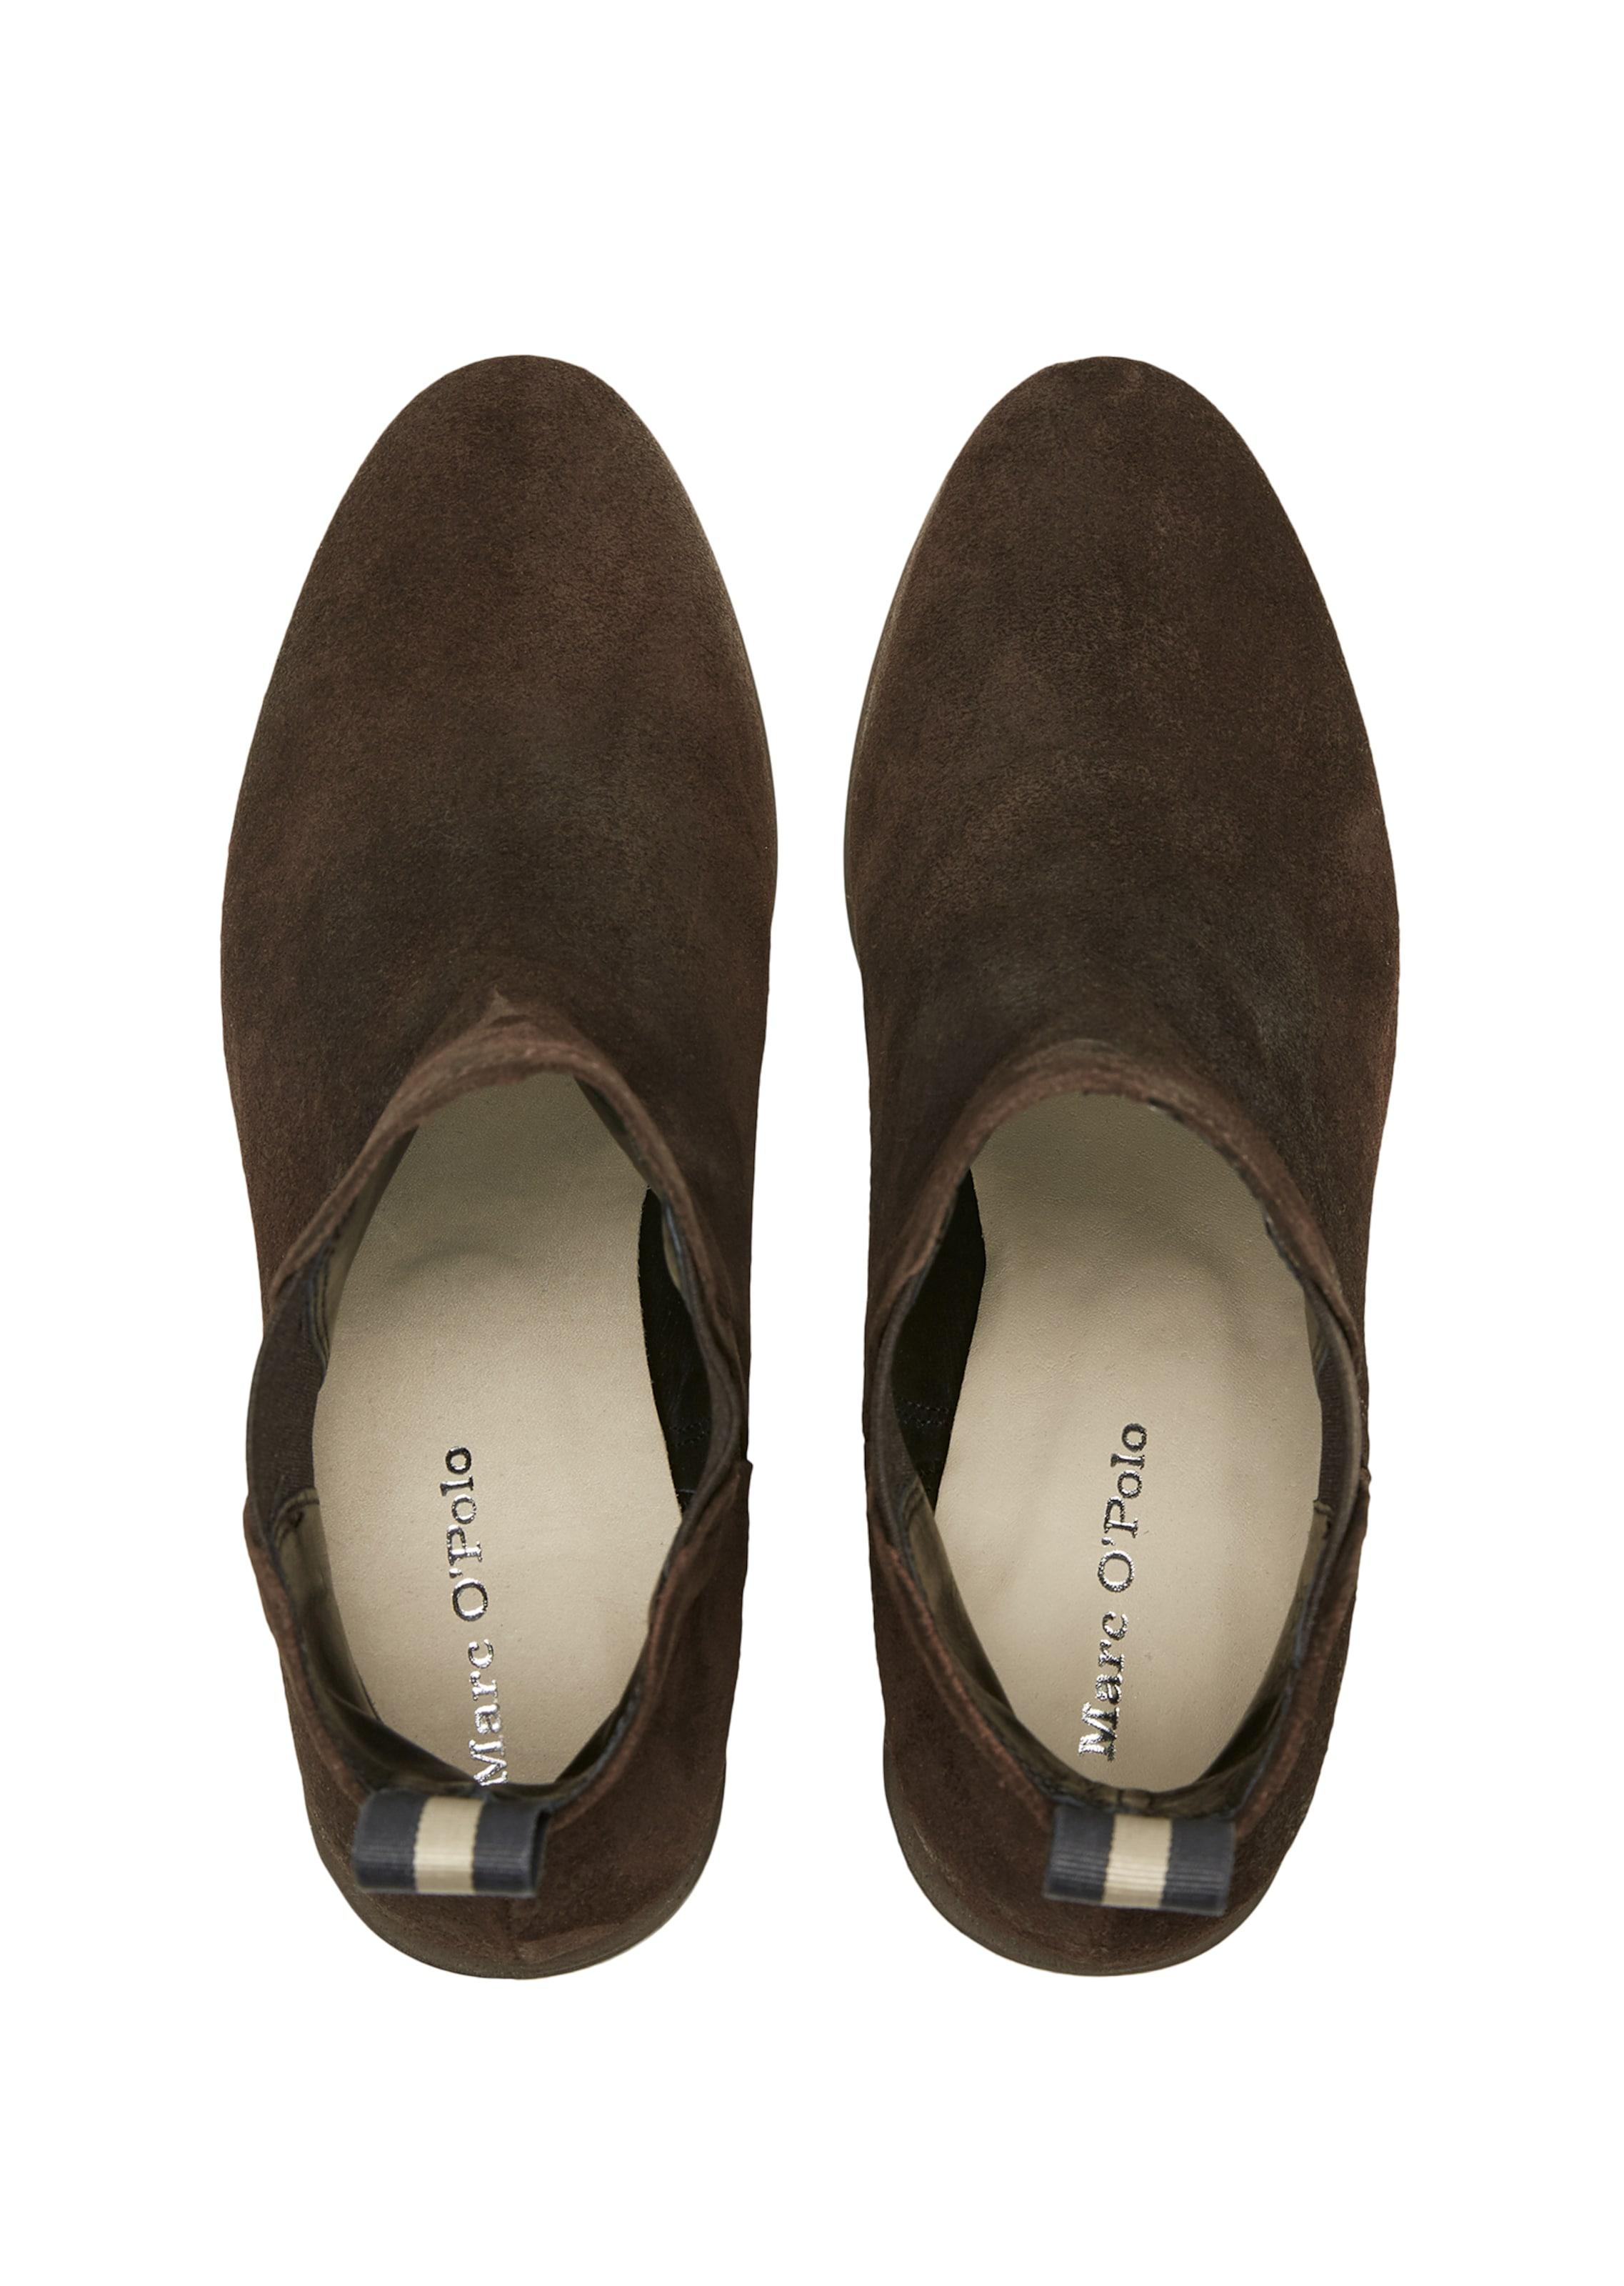 Marc O Polo Stiefeletten Günstige und langlebige Schuhe